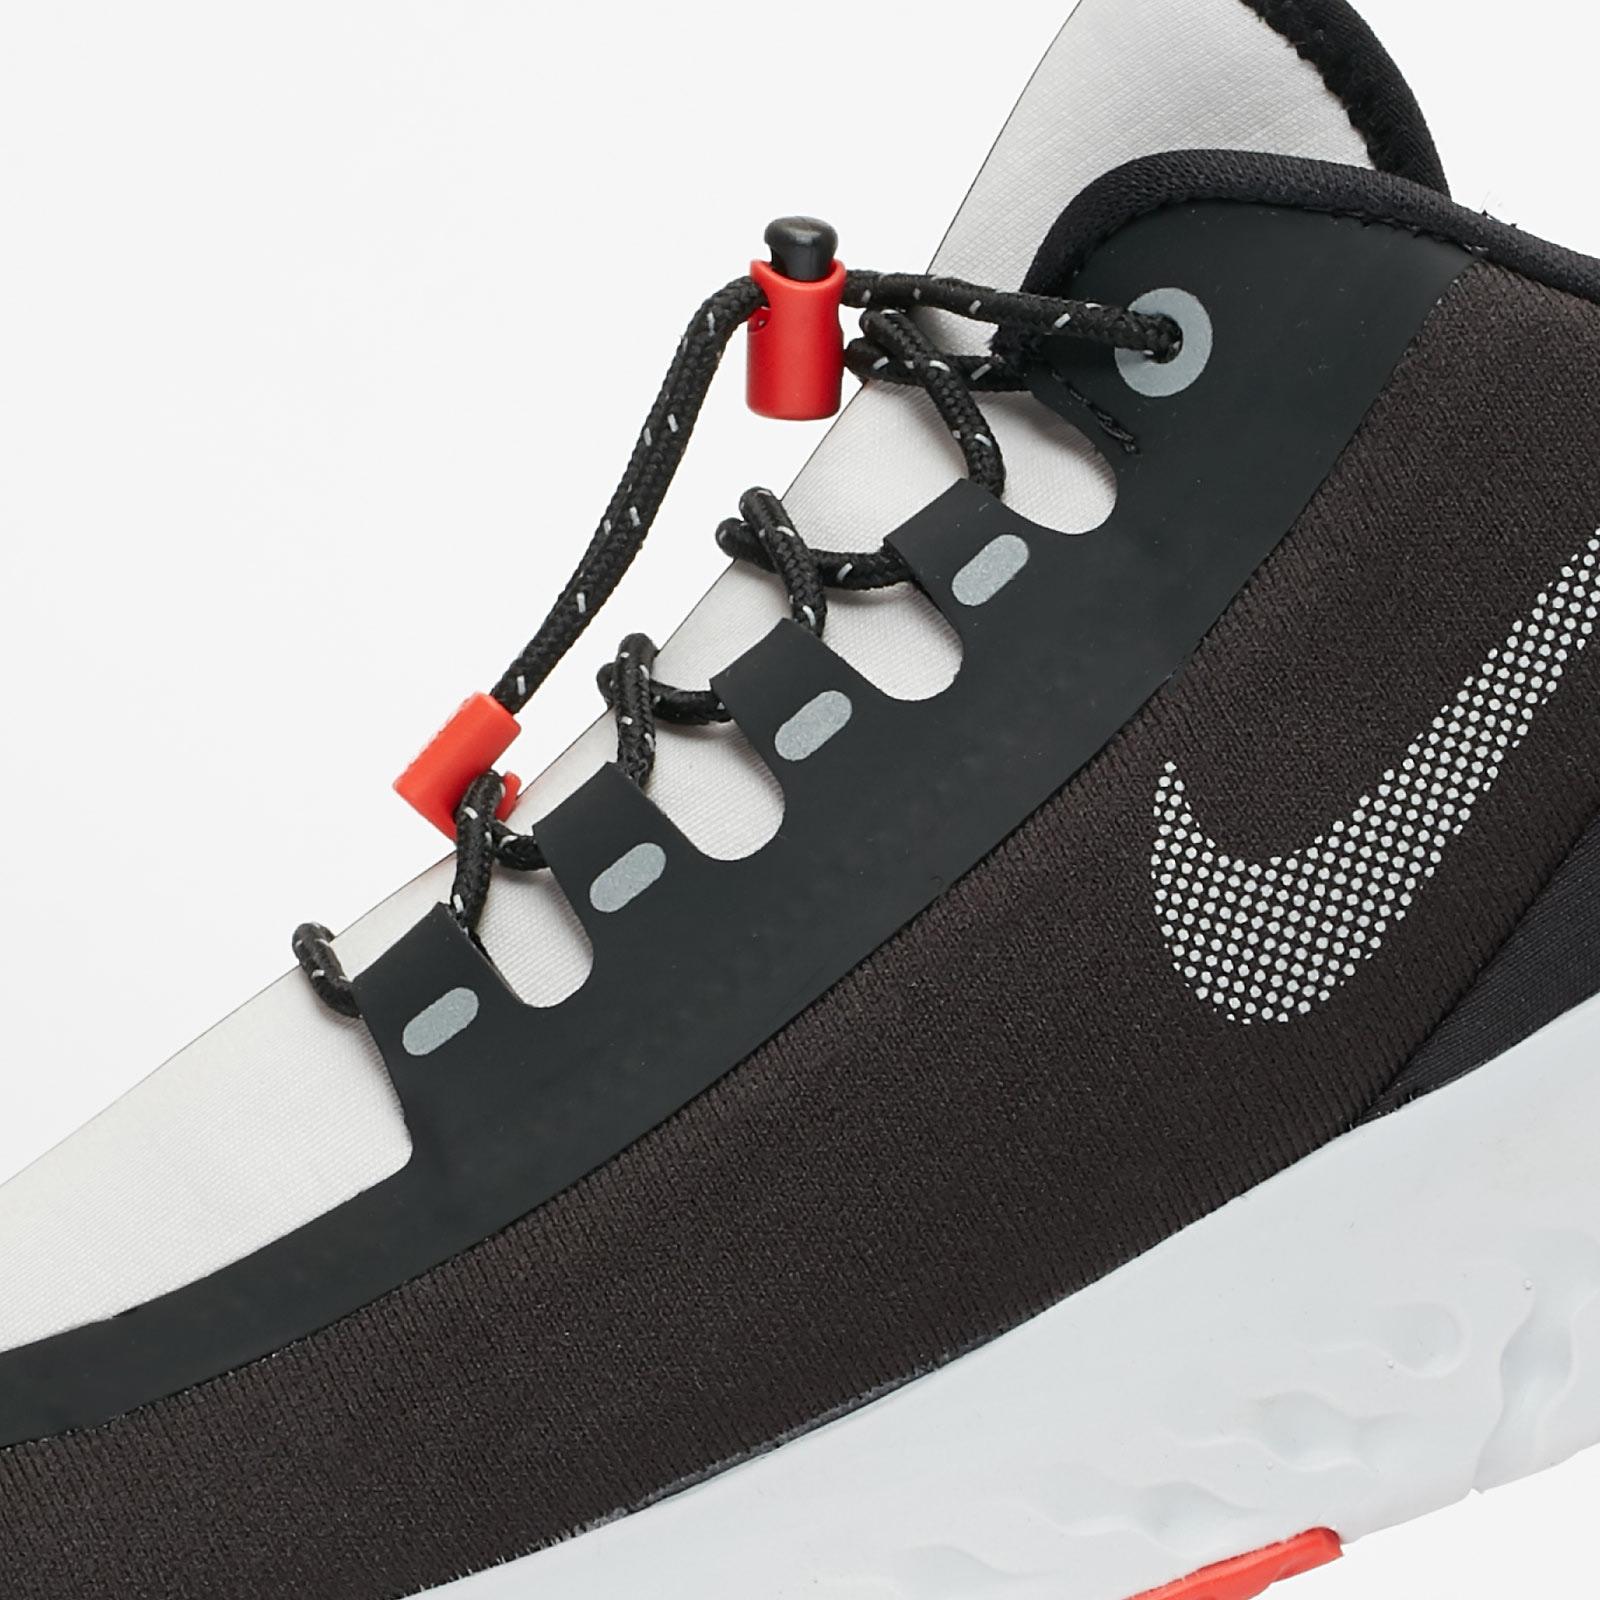 9d0bcff1ebed1 Nike Odyssey React Shield QS - Bq9780-006 - Sneakersnstuff ...